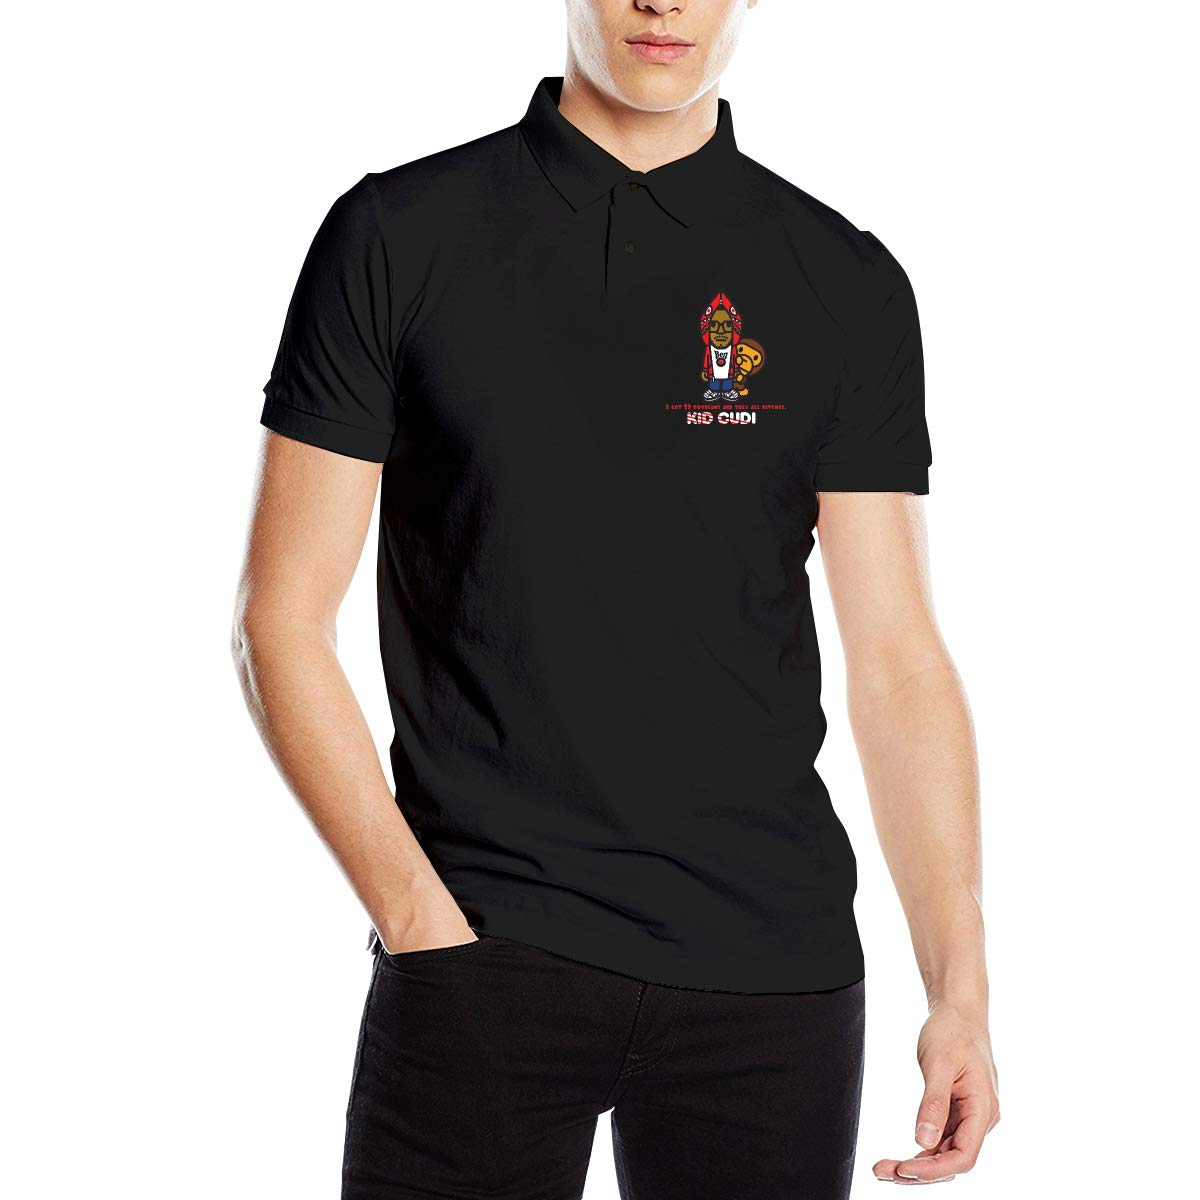 Cjlrqone Kid Cudi Mens Comfortable Polo Shirts XXL Black